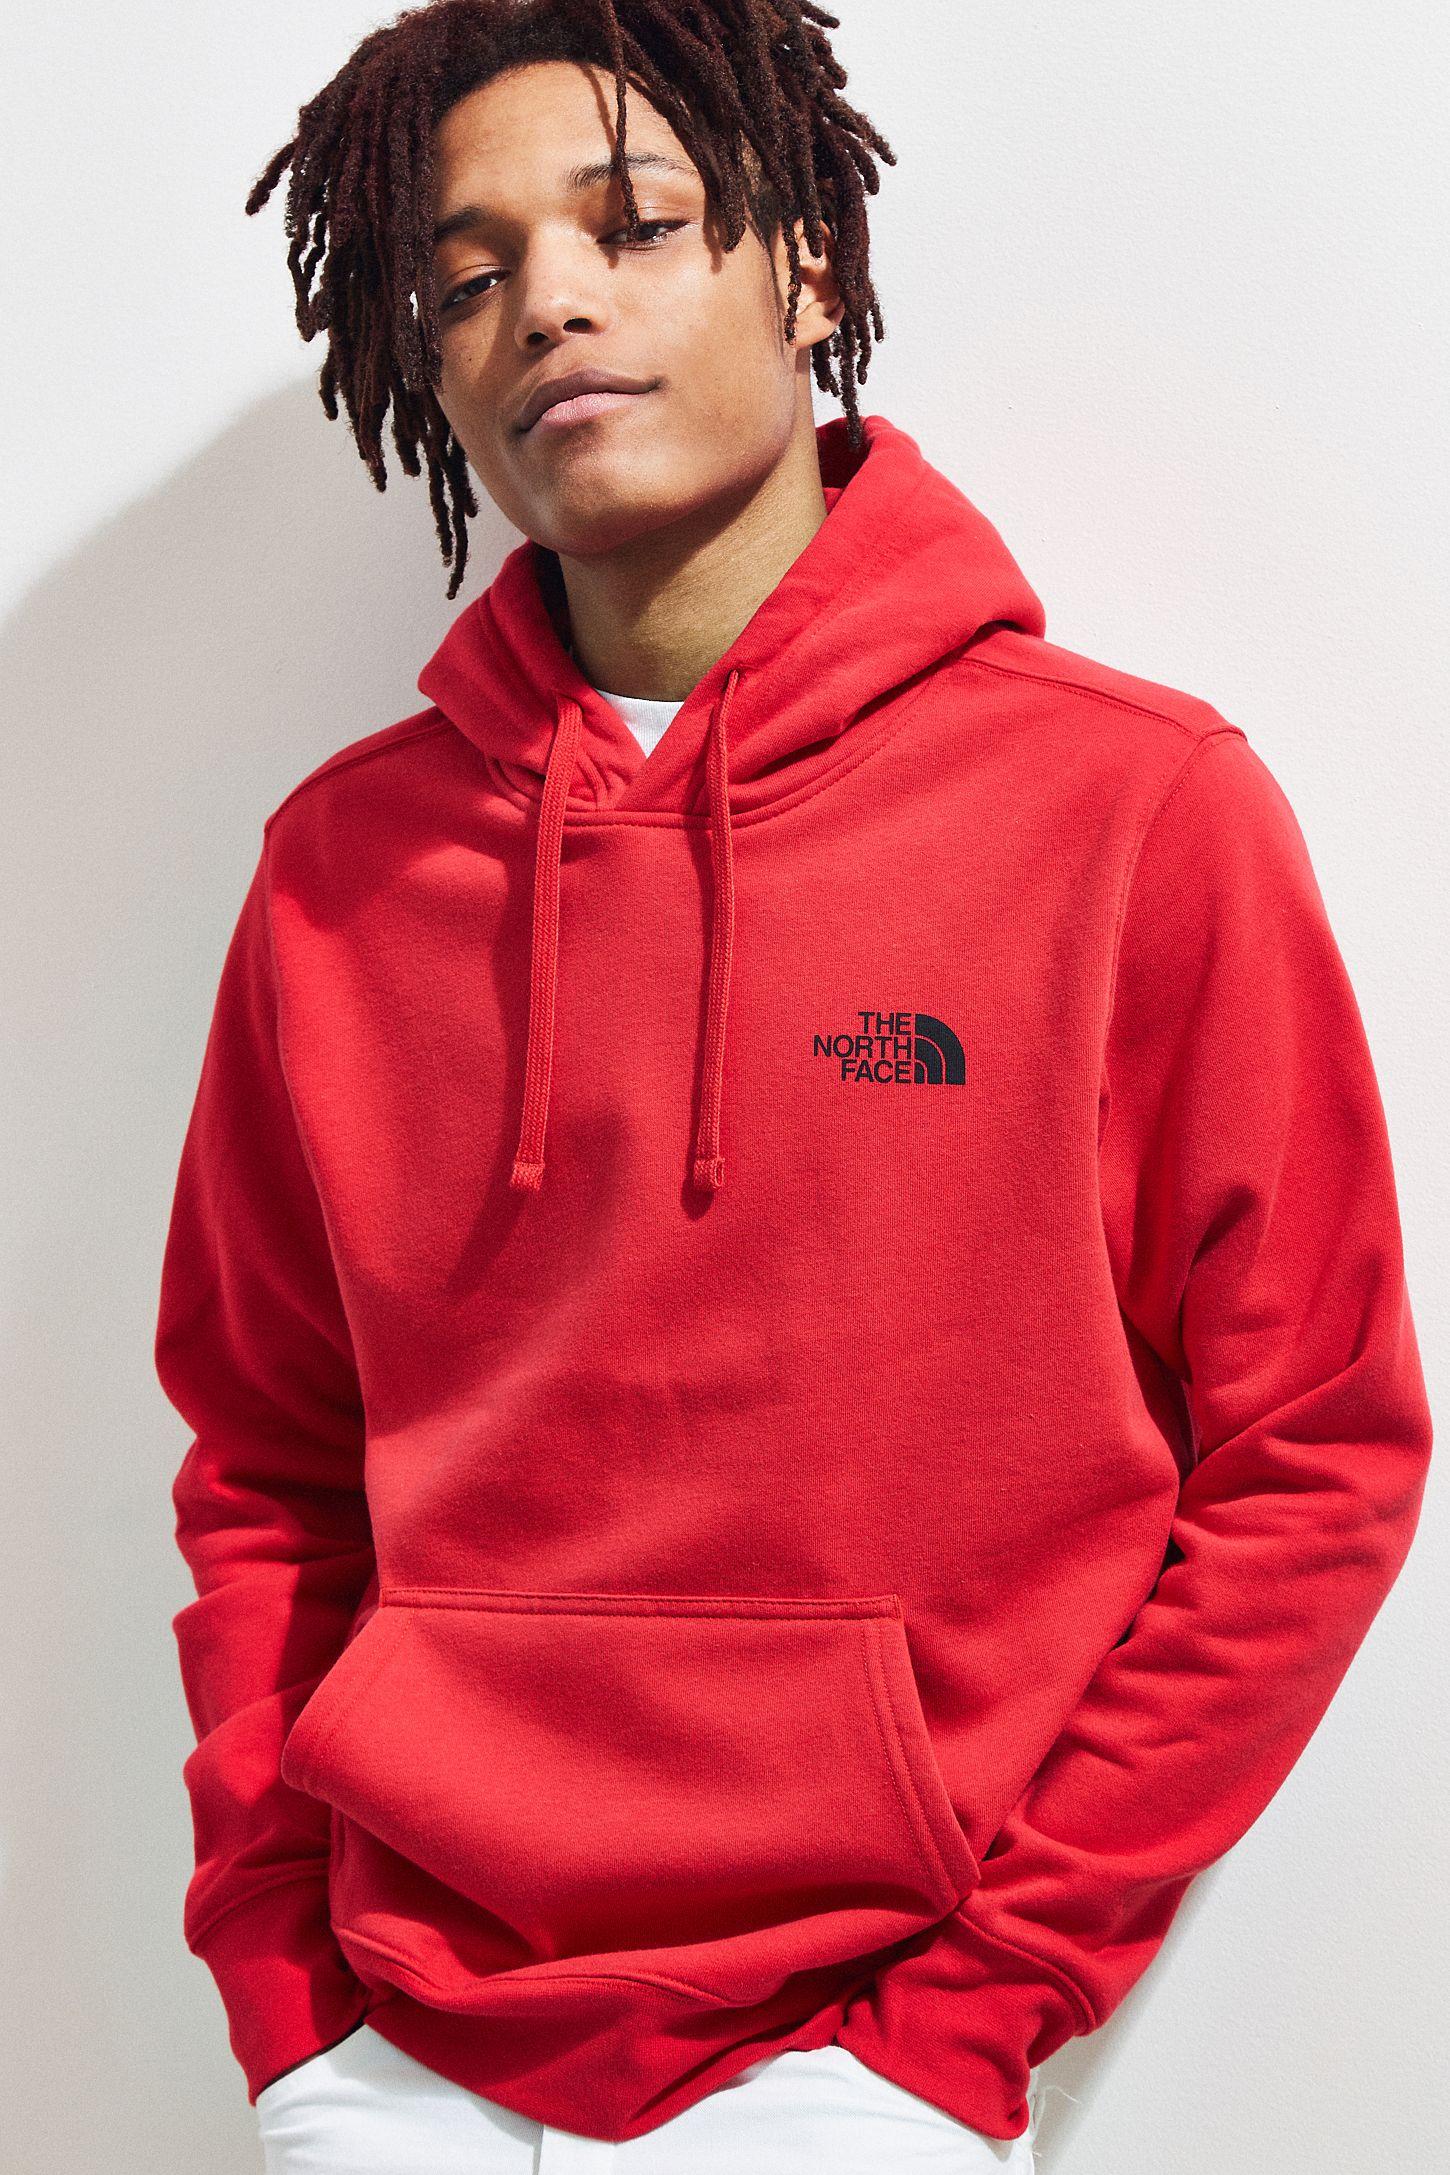 eaba4f0c91c0 The North Face Red Box Logo Hoodie Sweatshirt